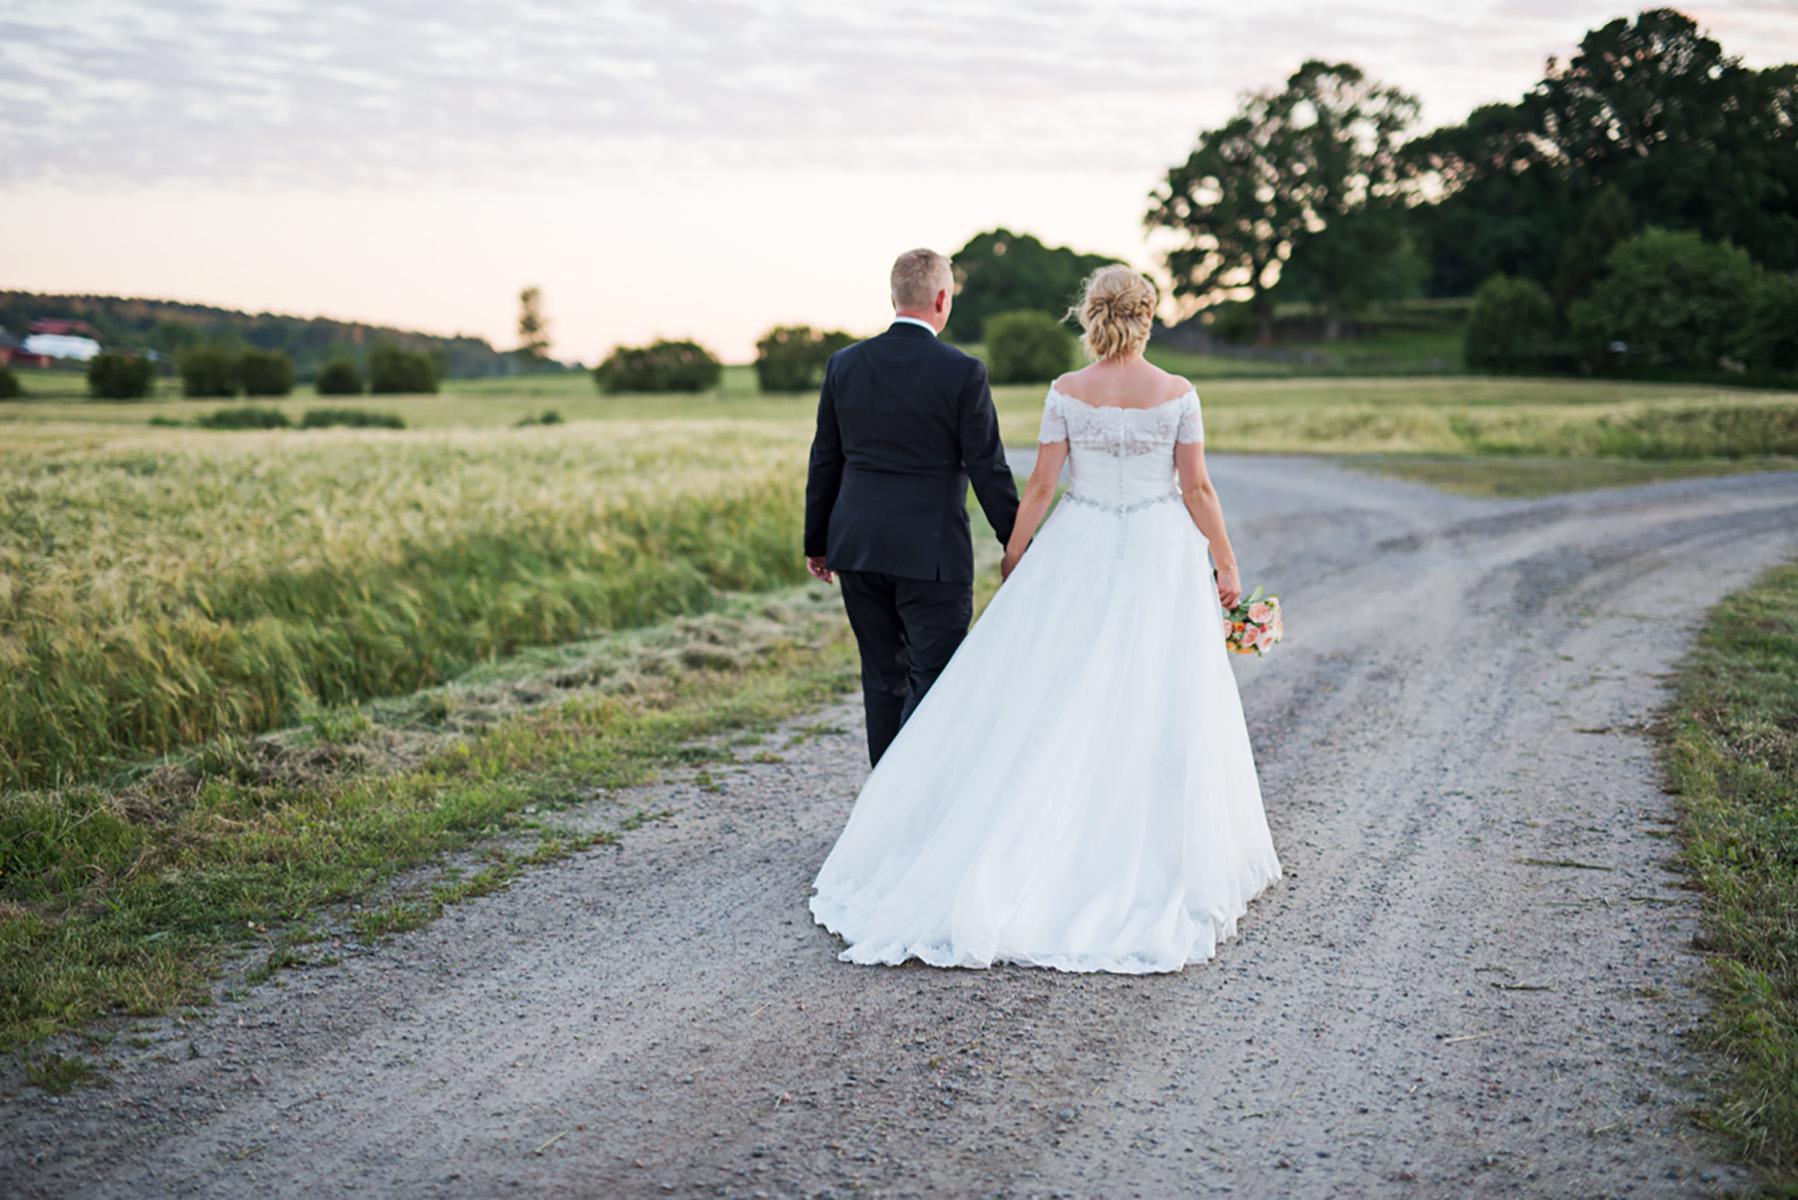 Jimmy & Caroline – Bröllop i Istorp